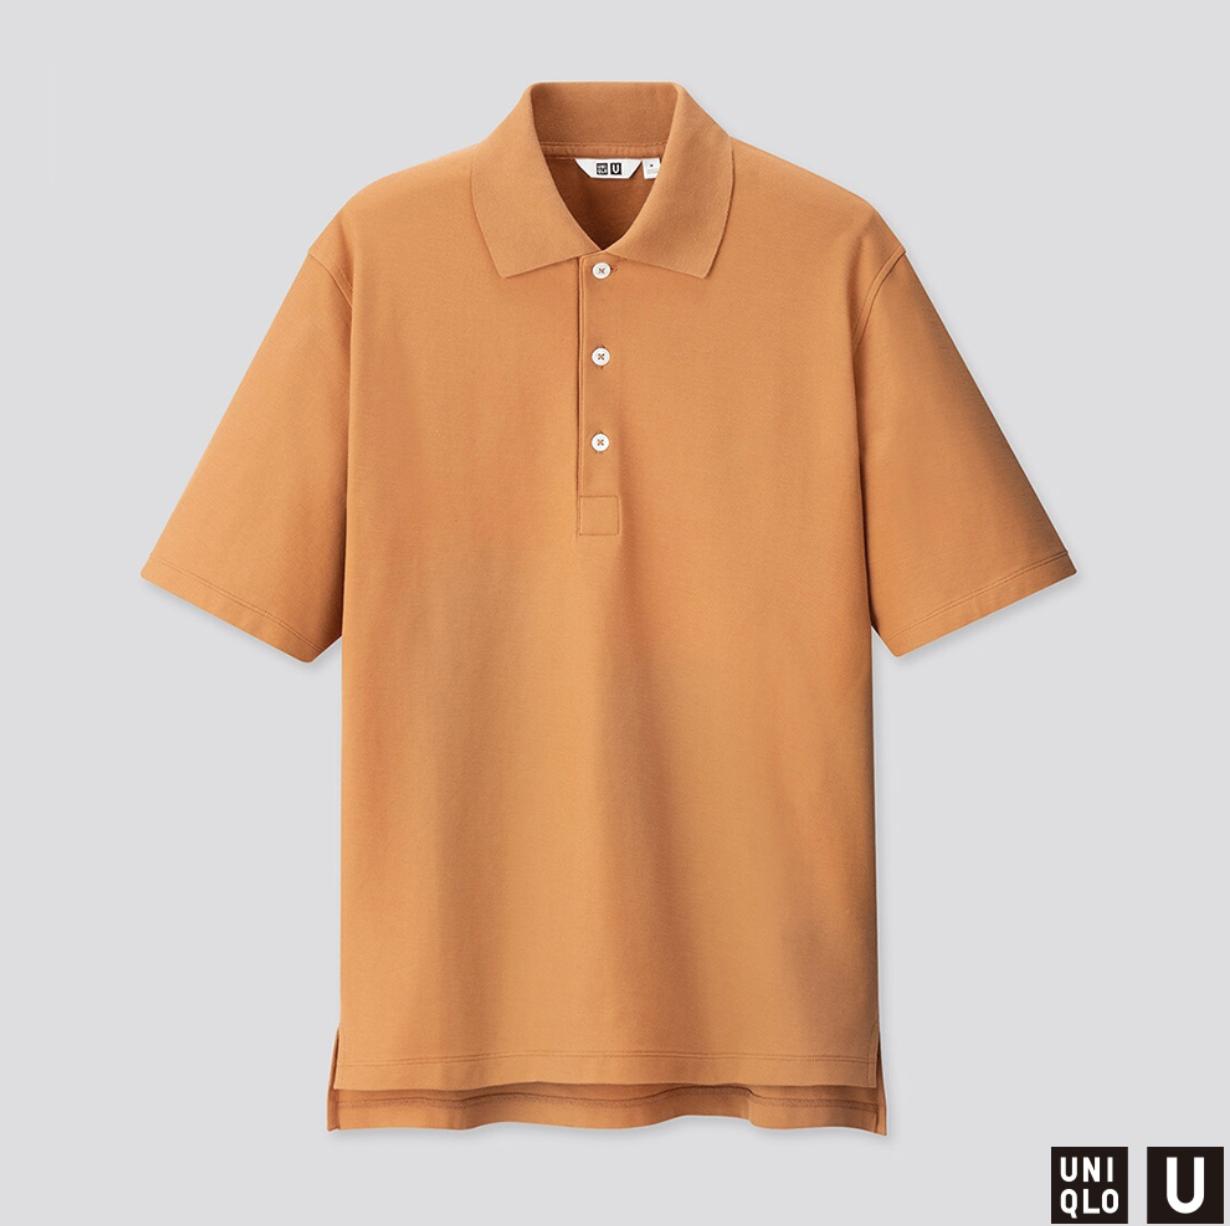 UNIQLO 优衣库 U系列 423241 男款短袖POLO衫